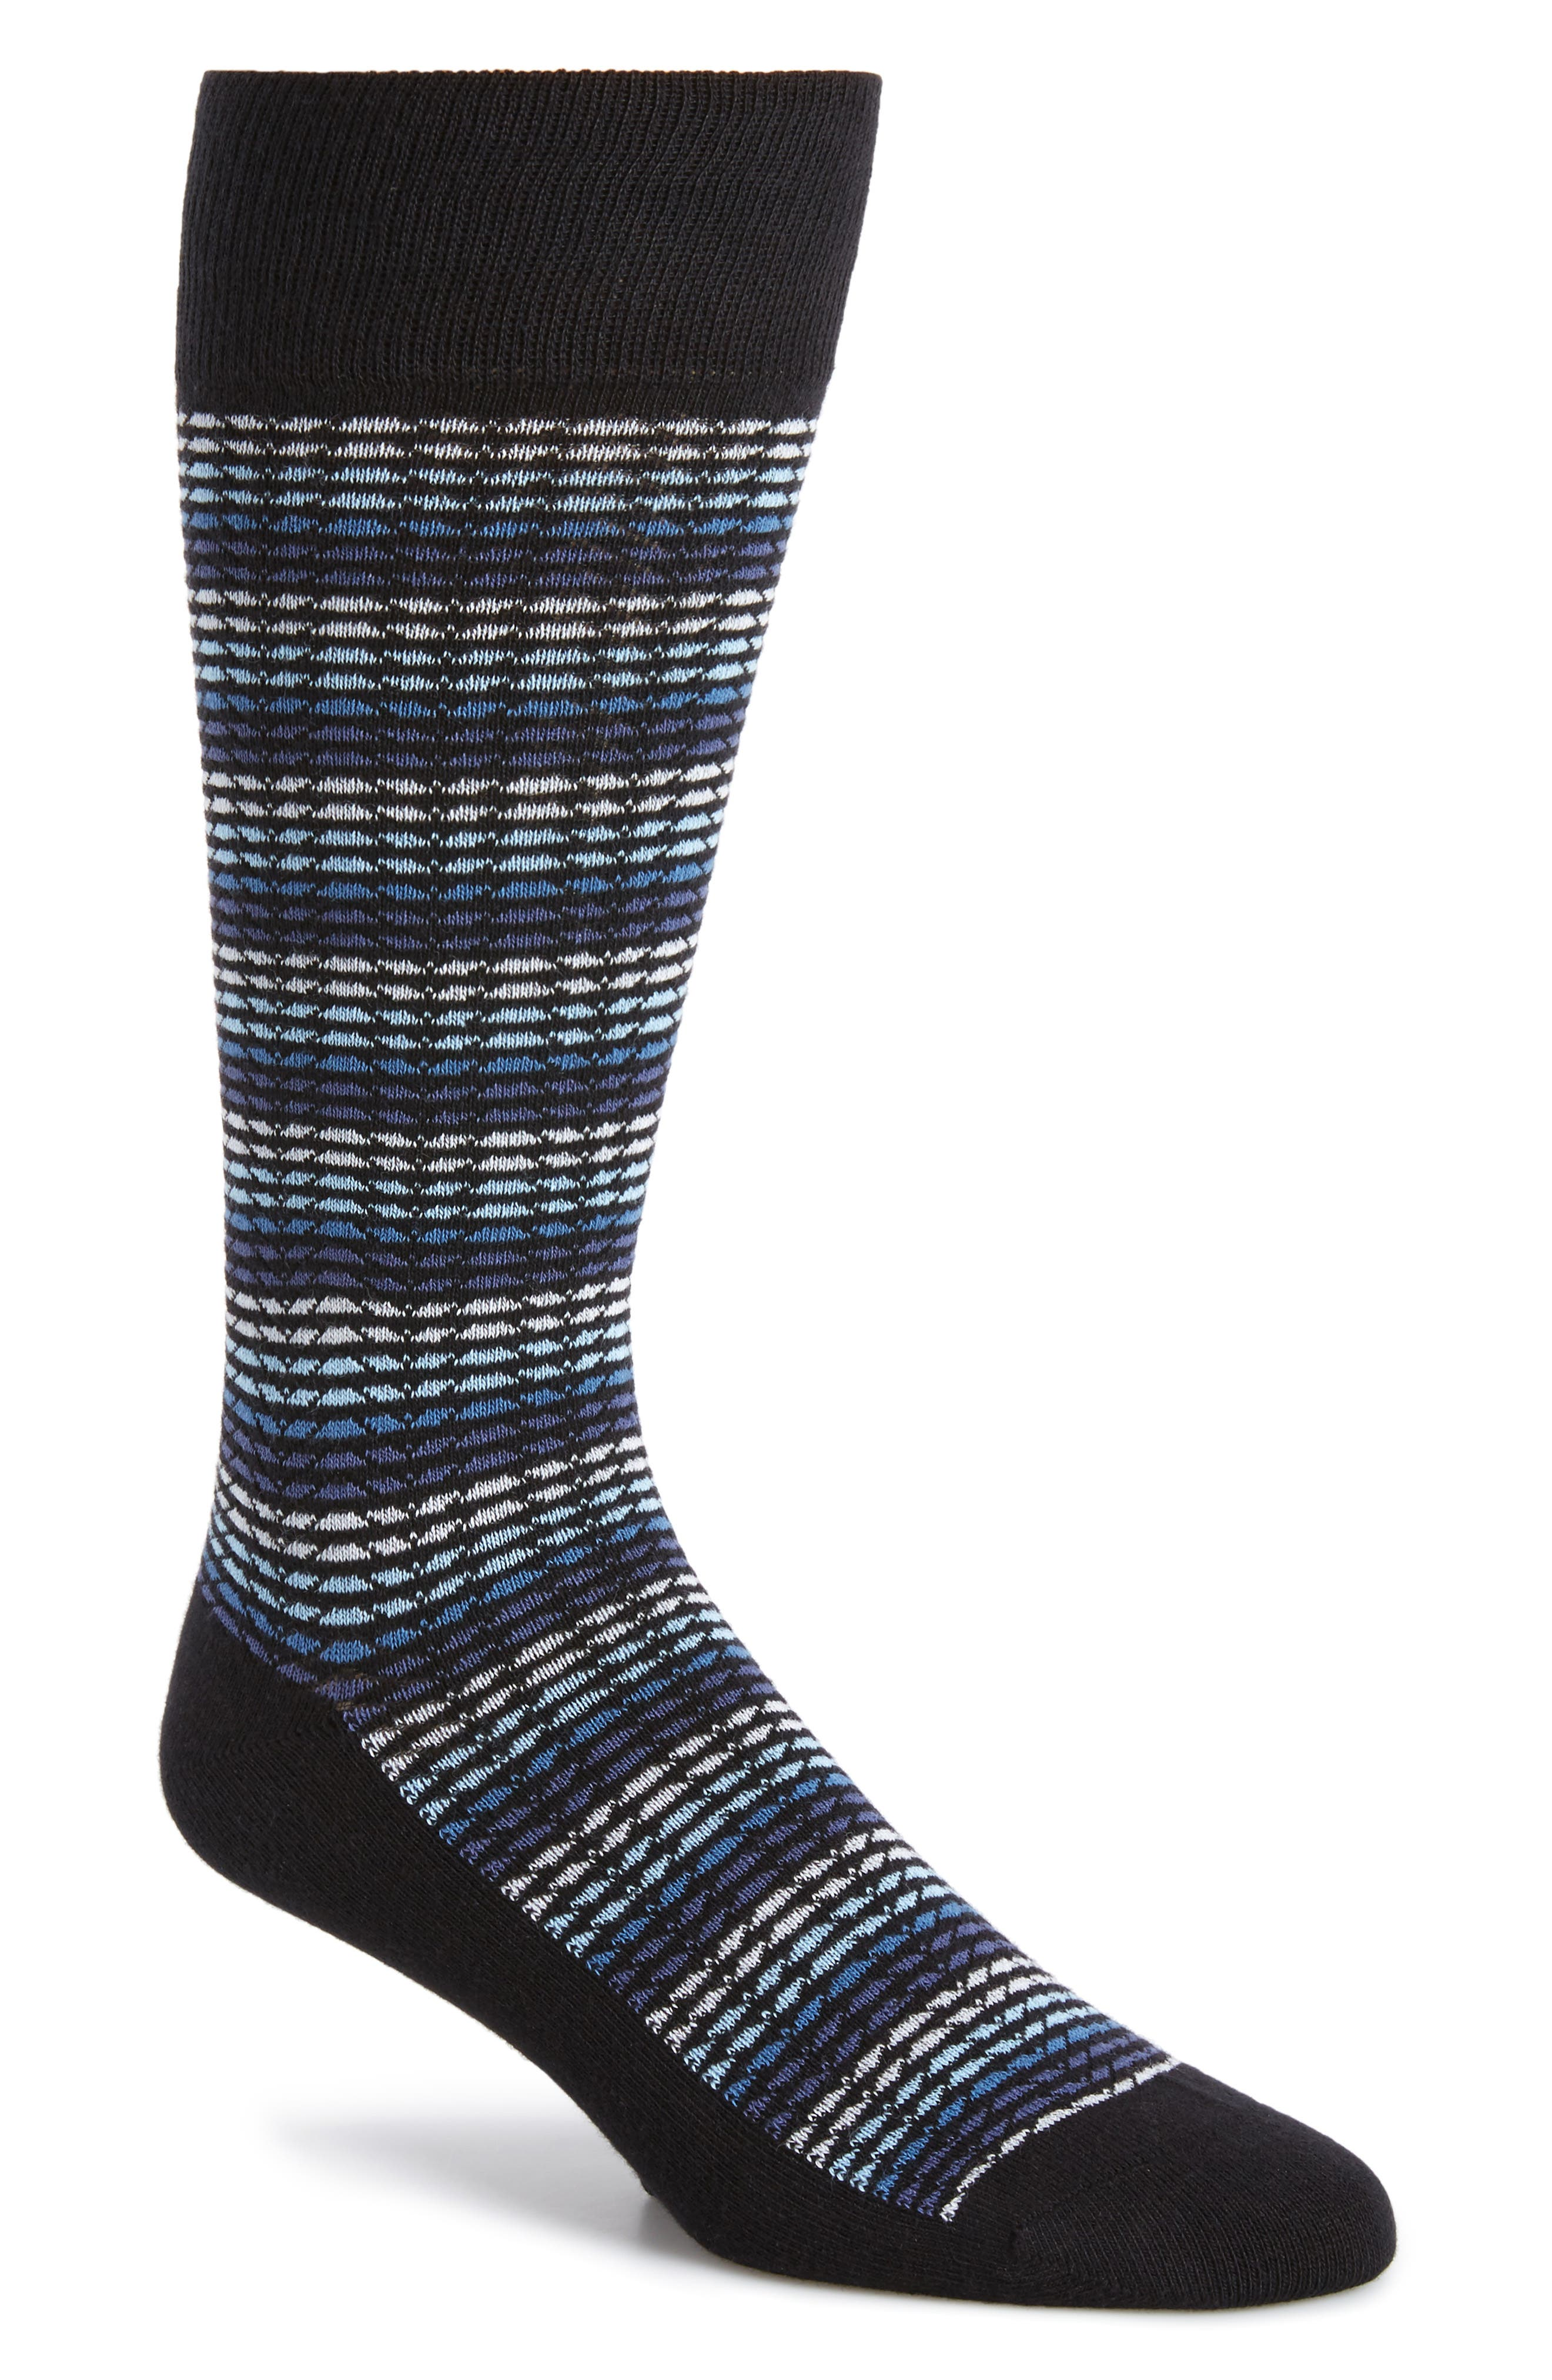 CALIBRATE Herringbone Stripe Socks